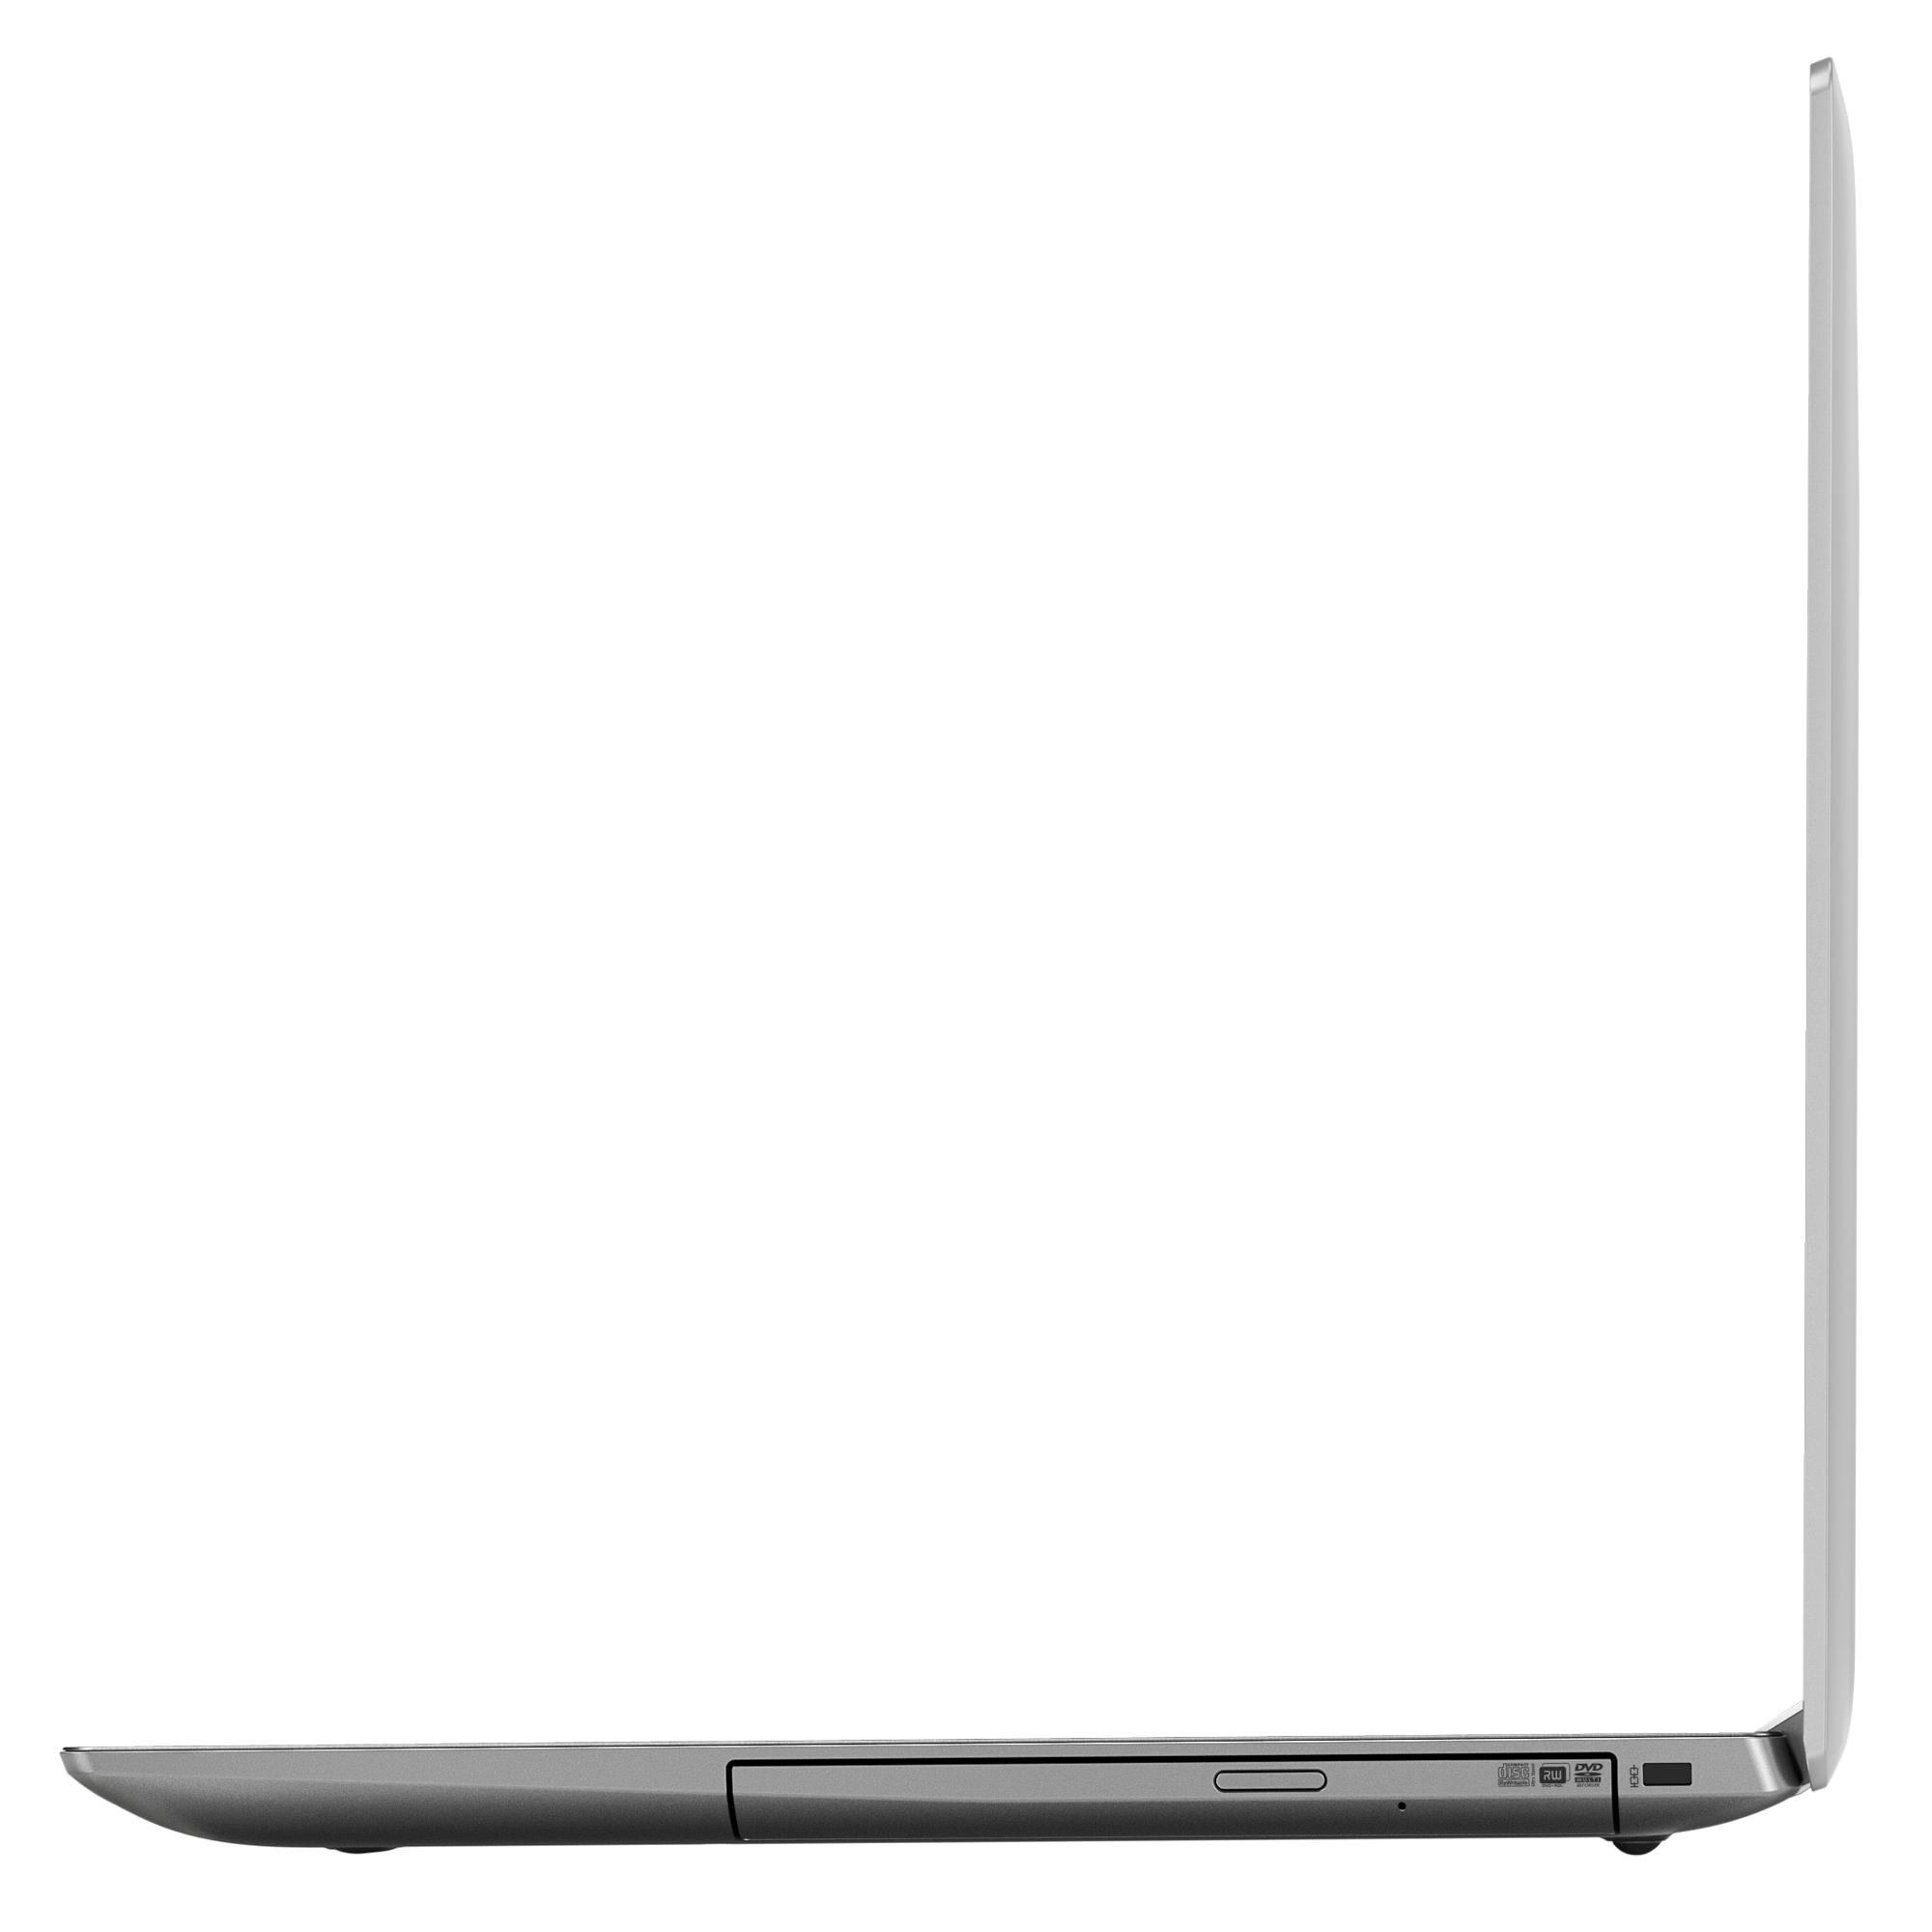 Фото  Ноутбук Lenovo ideapad 330-15 Onyx Black (81D100HQRA)